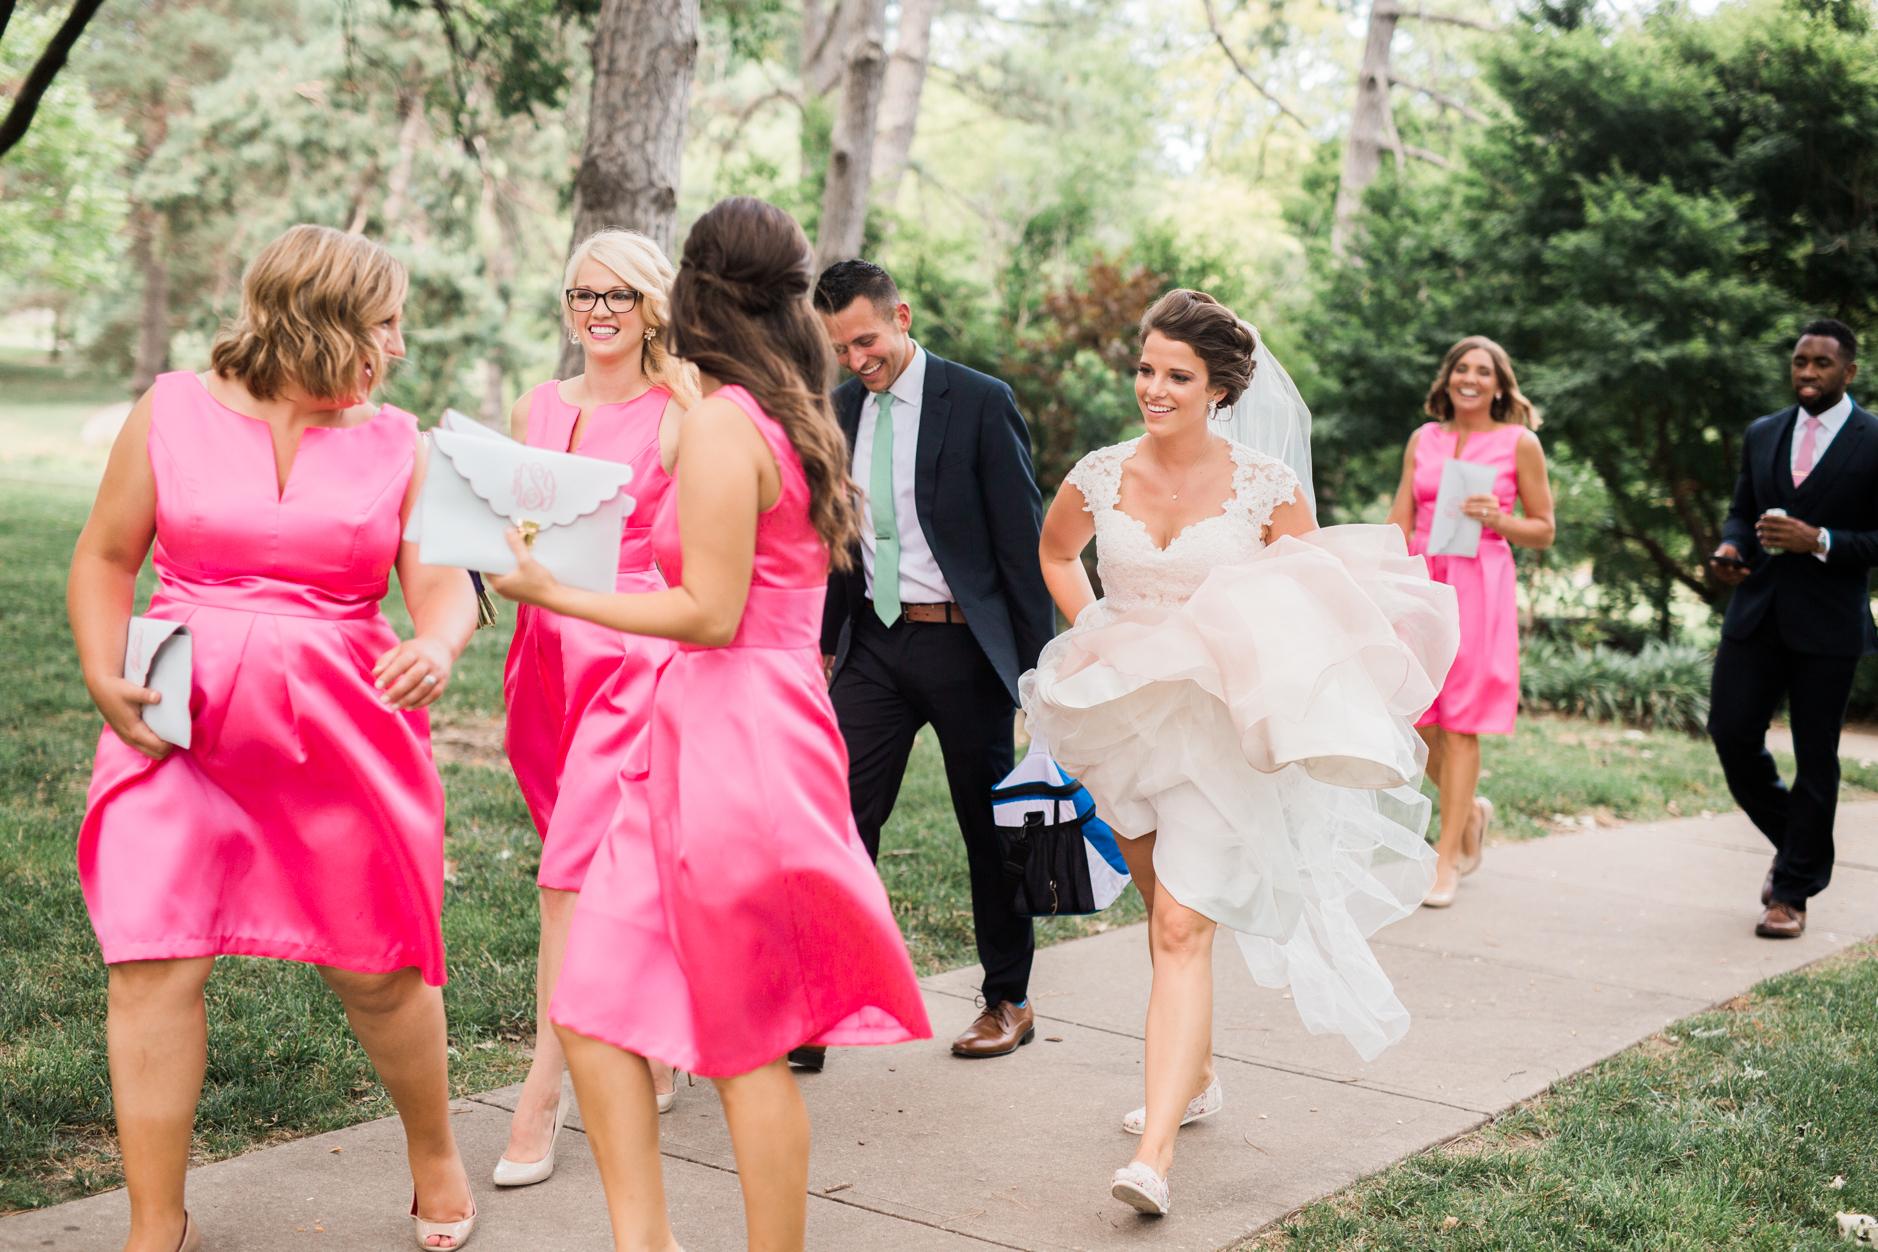 LegacyUnion-Wedding-Photographer-Glendale-CA-41.jpg